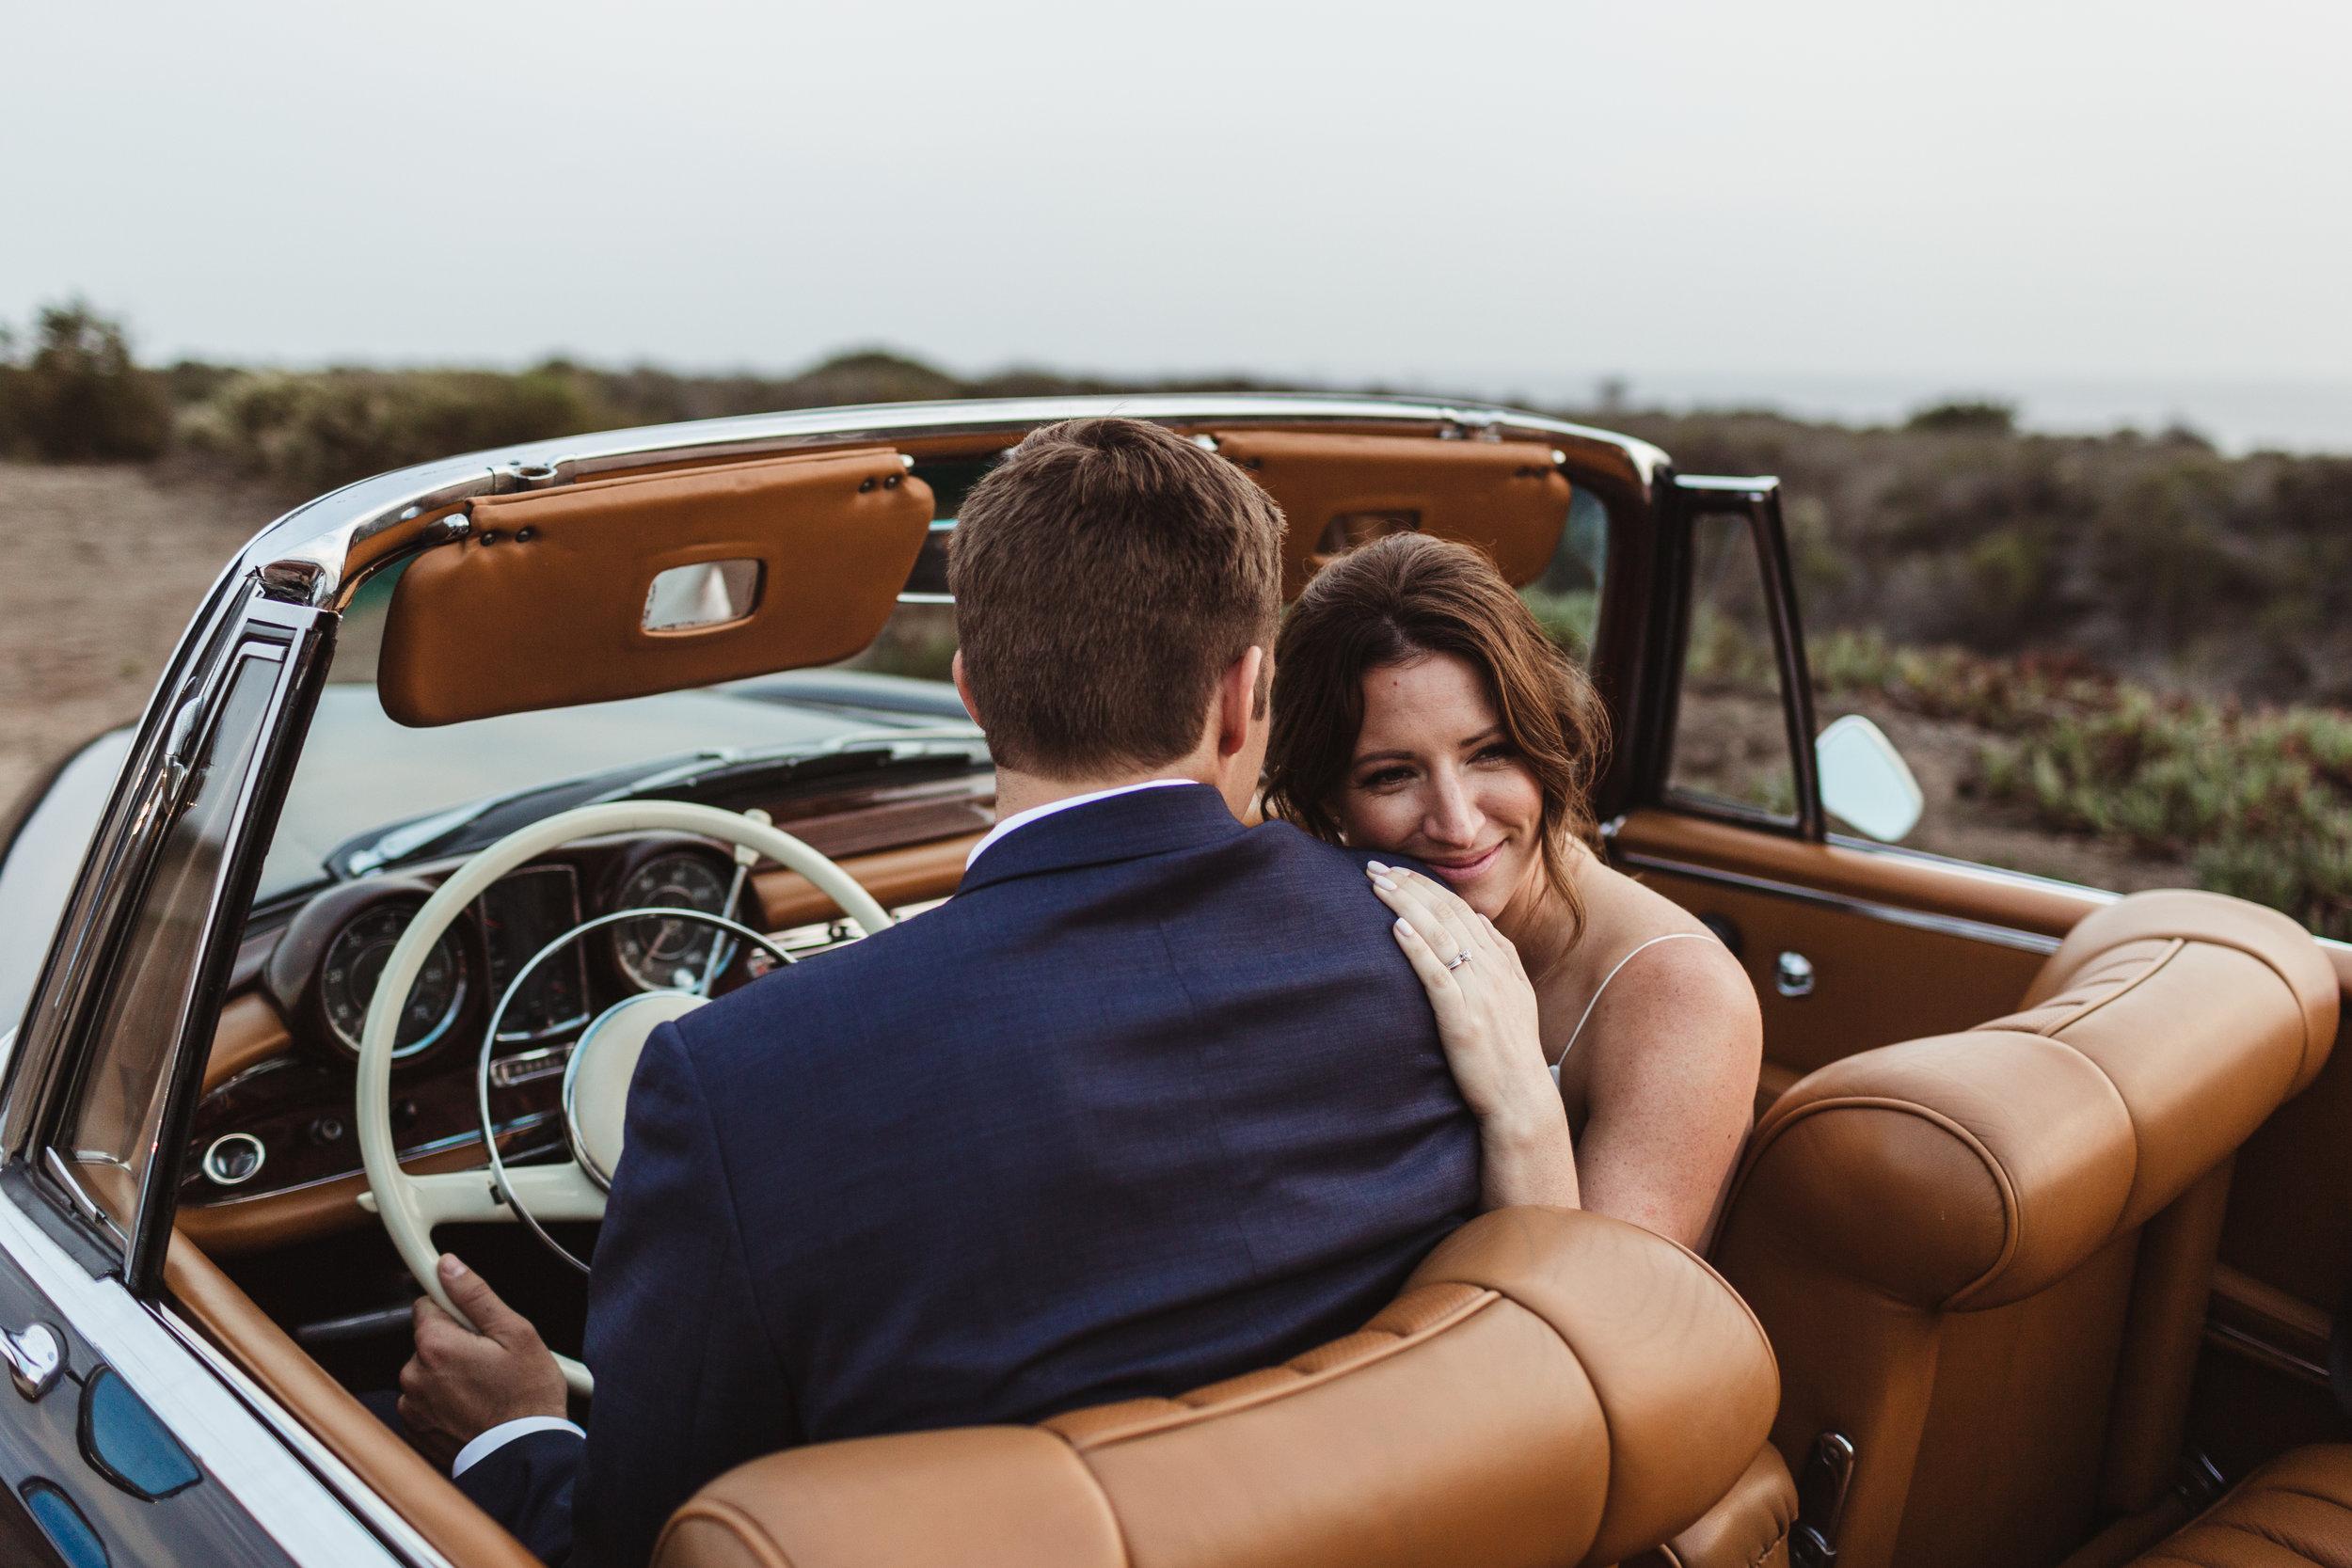 Jamie_English_Photography_JordanErik_Dos_Pueblos_Orchid_Wedding_Santa_Barbara_Fall2018-905.jpg